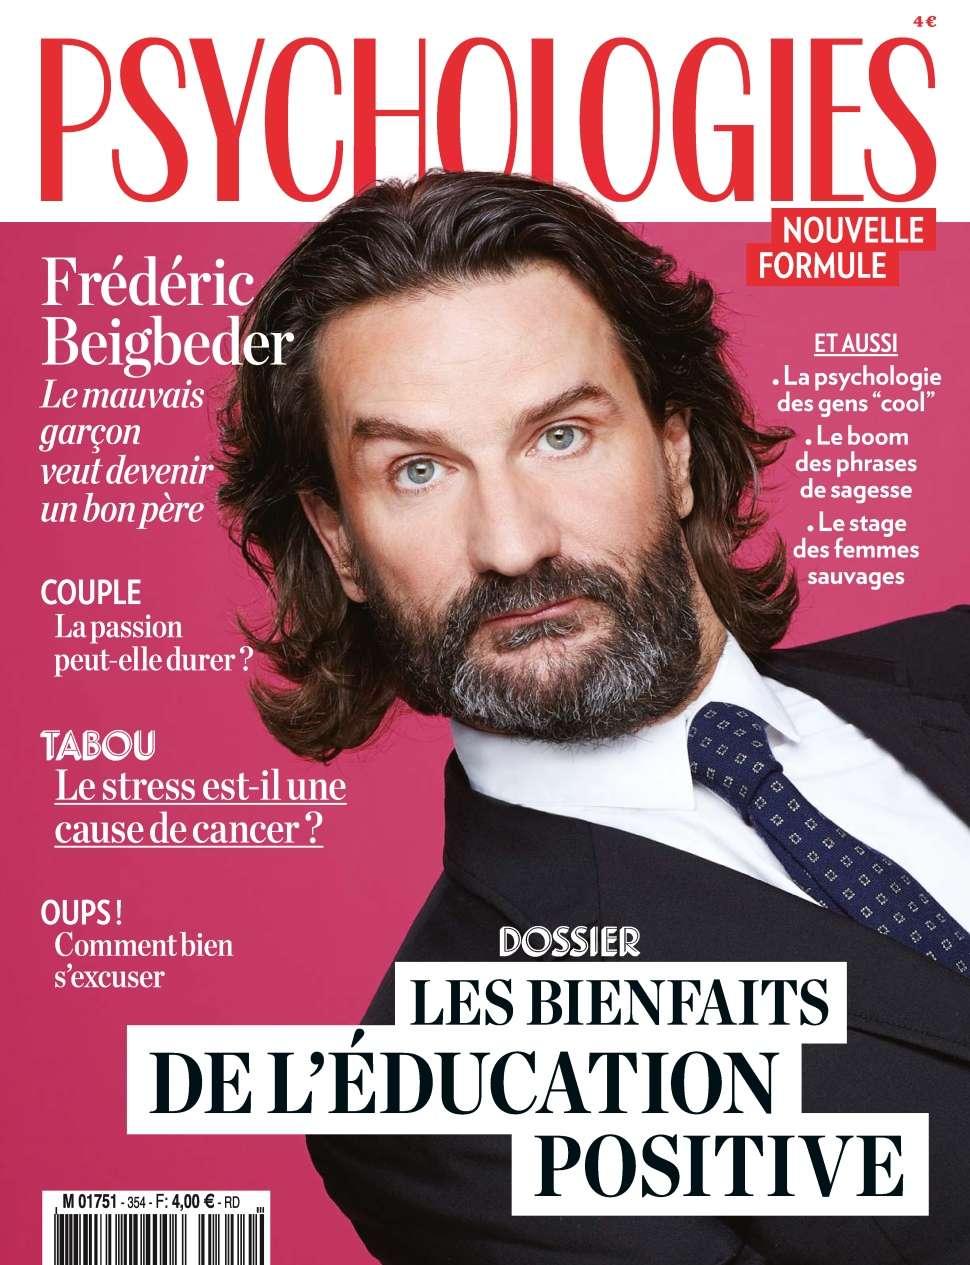 Psychologies Magazine 354 - Septembre 2015